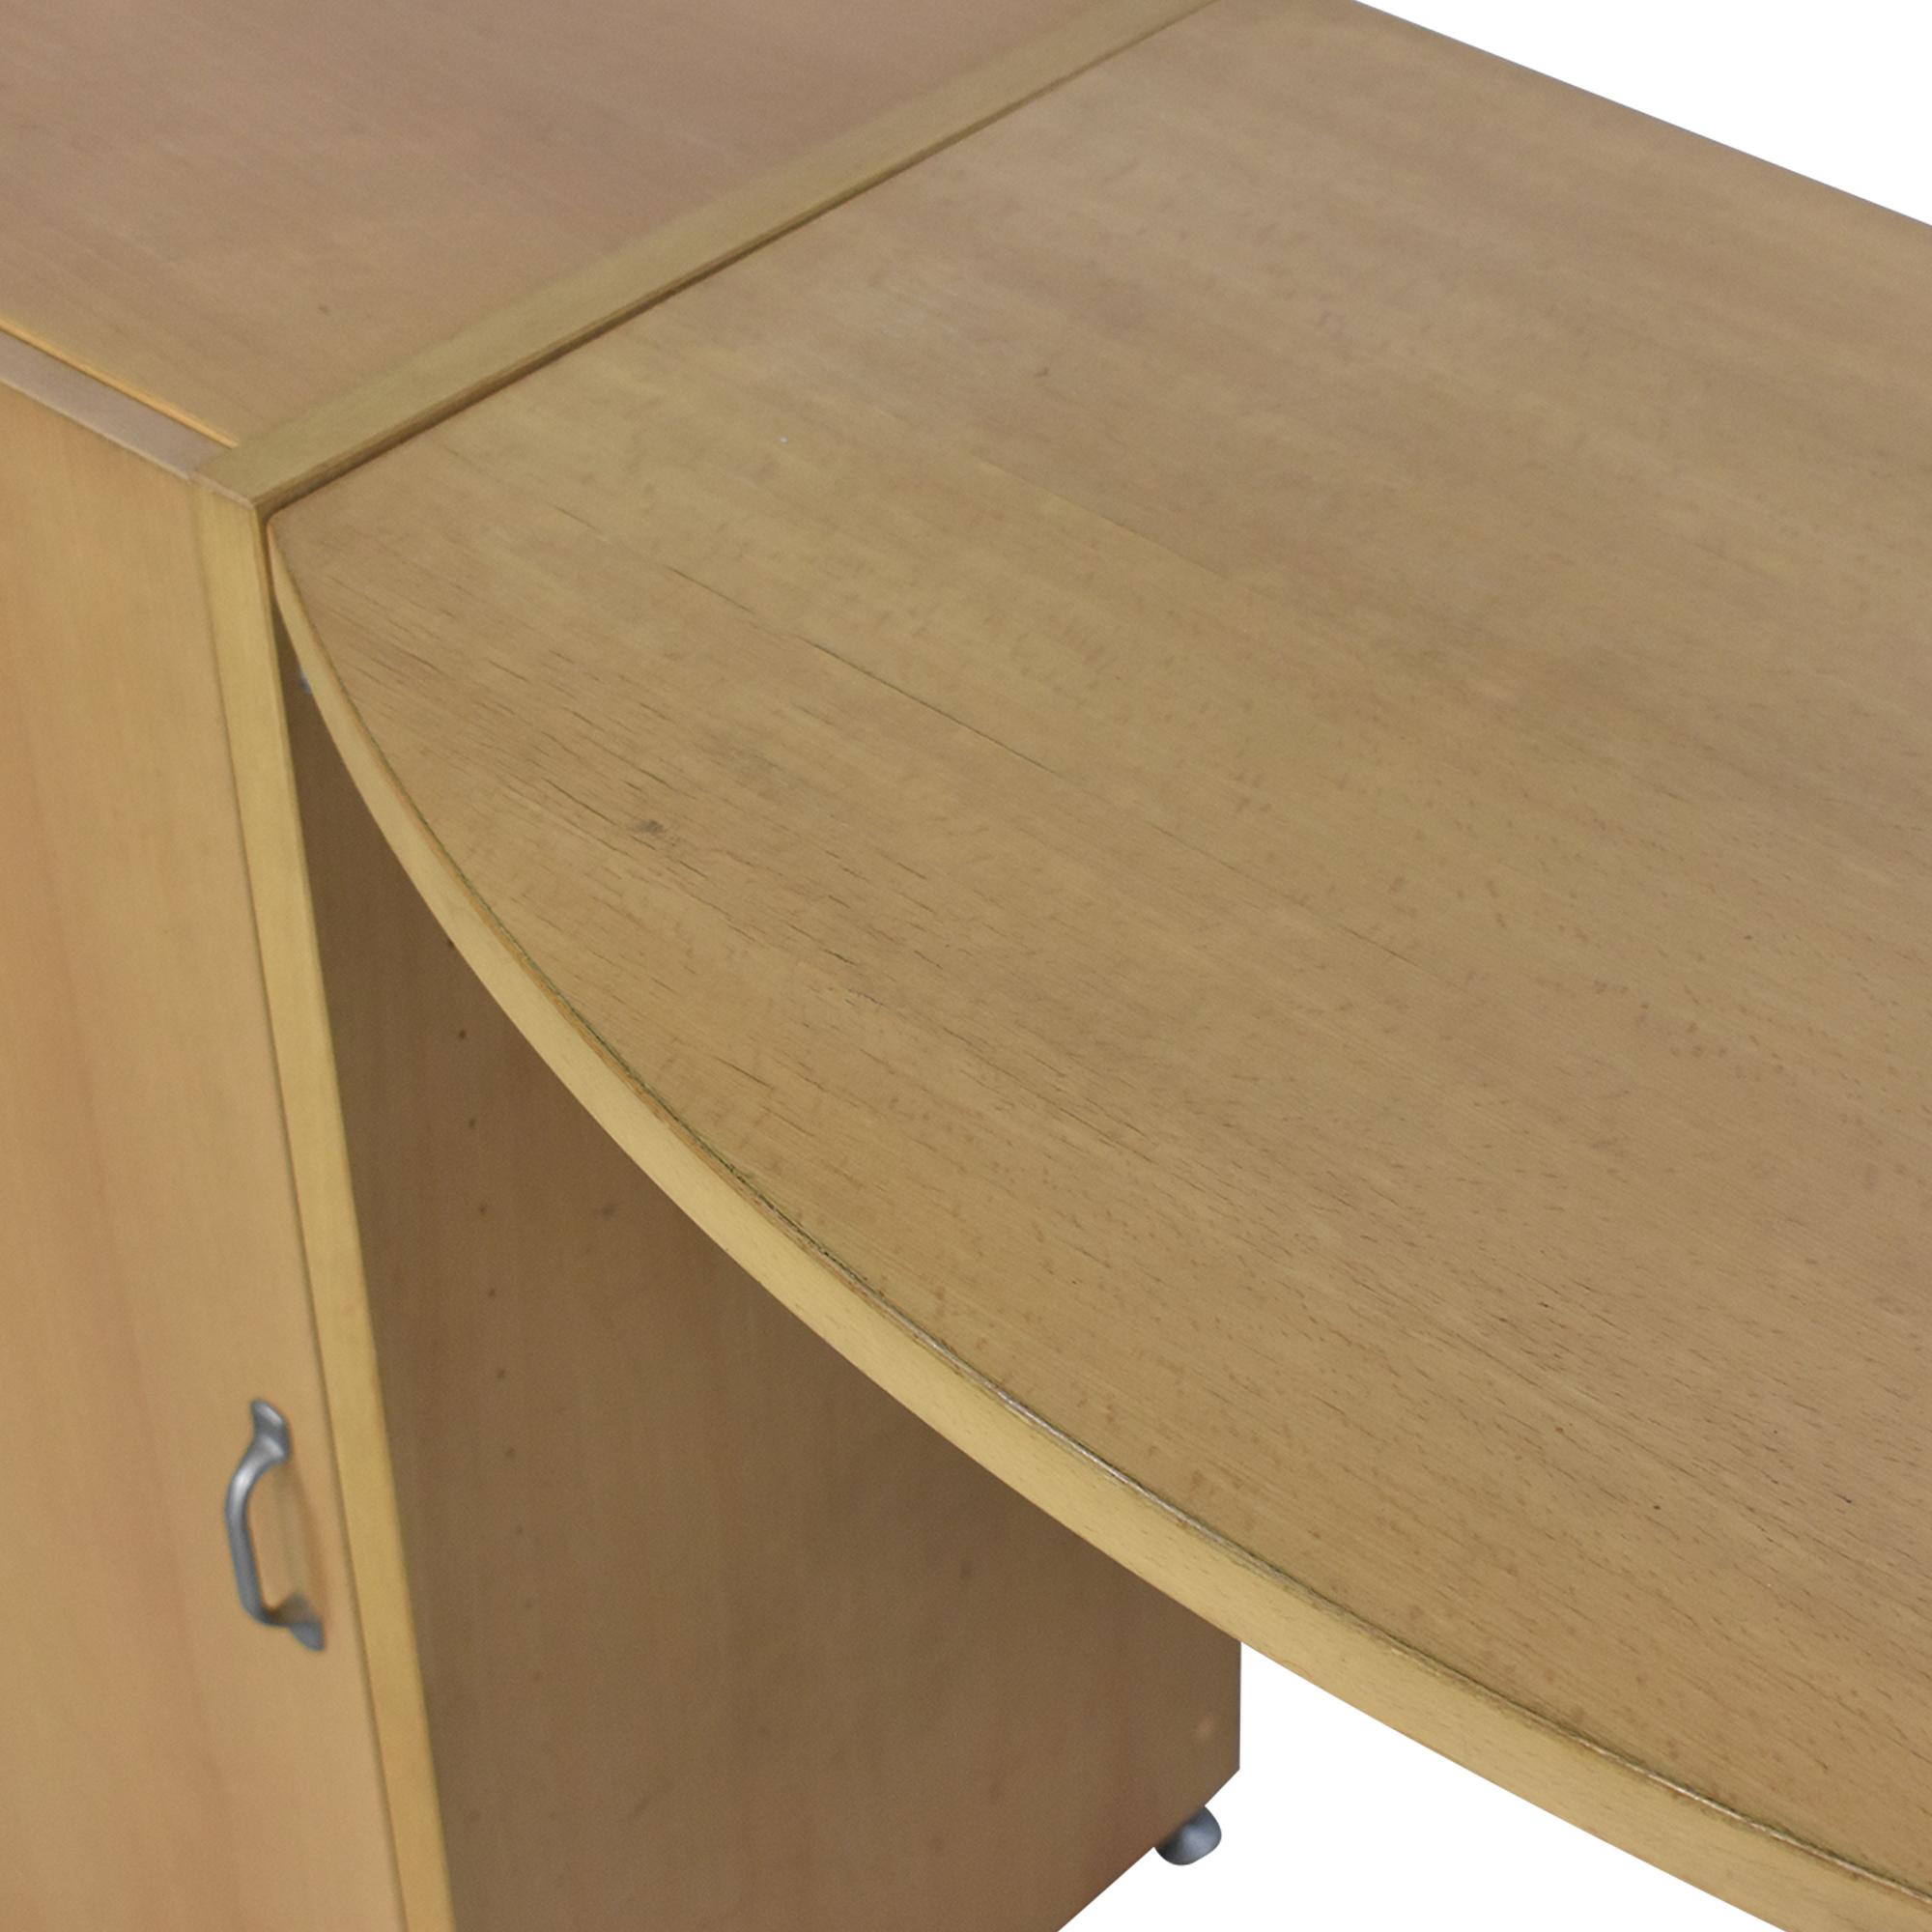 BoConcept BoConcept Office Desk dimensions